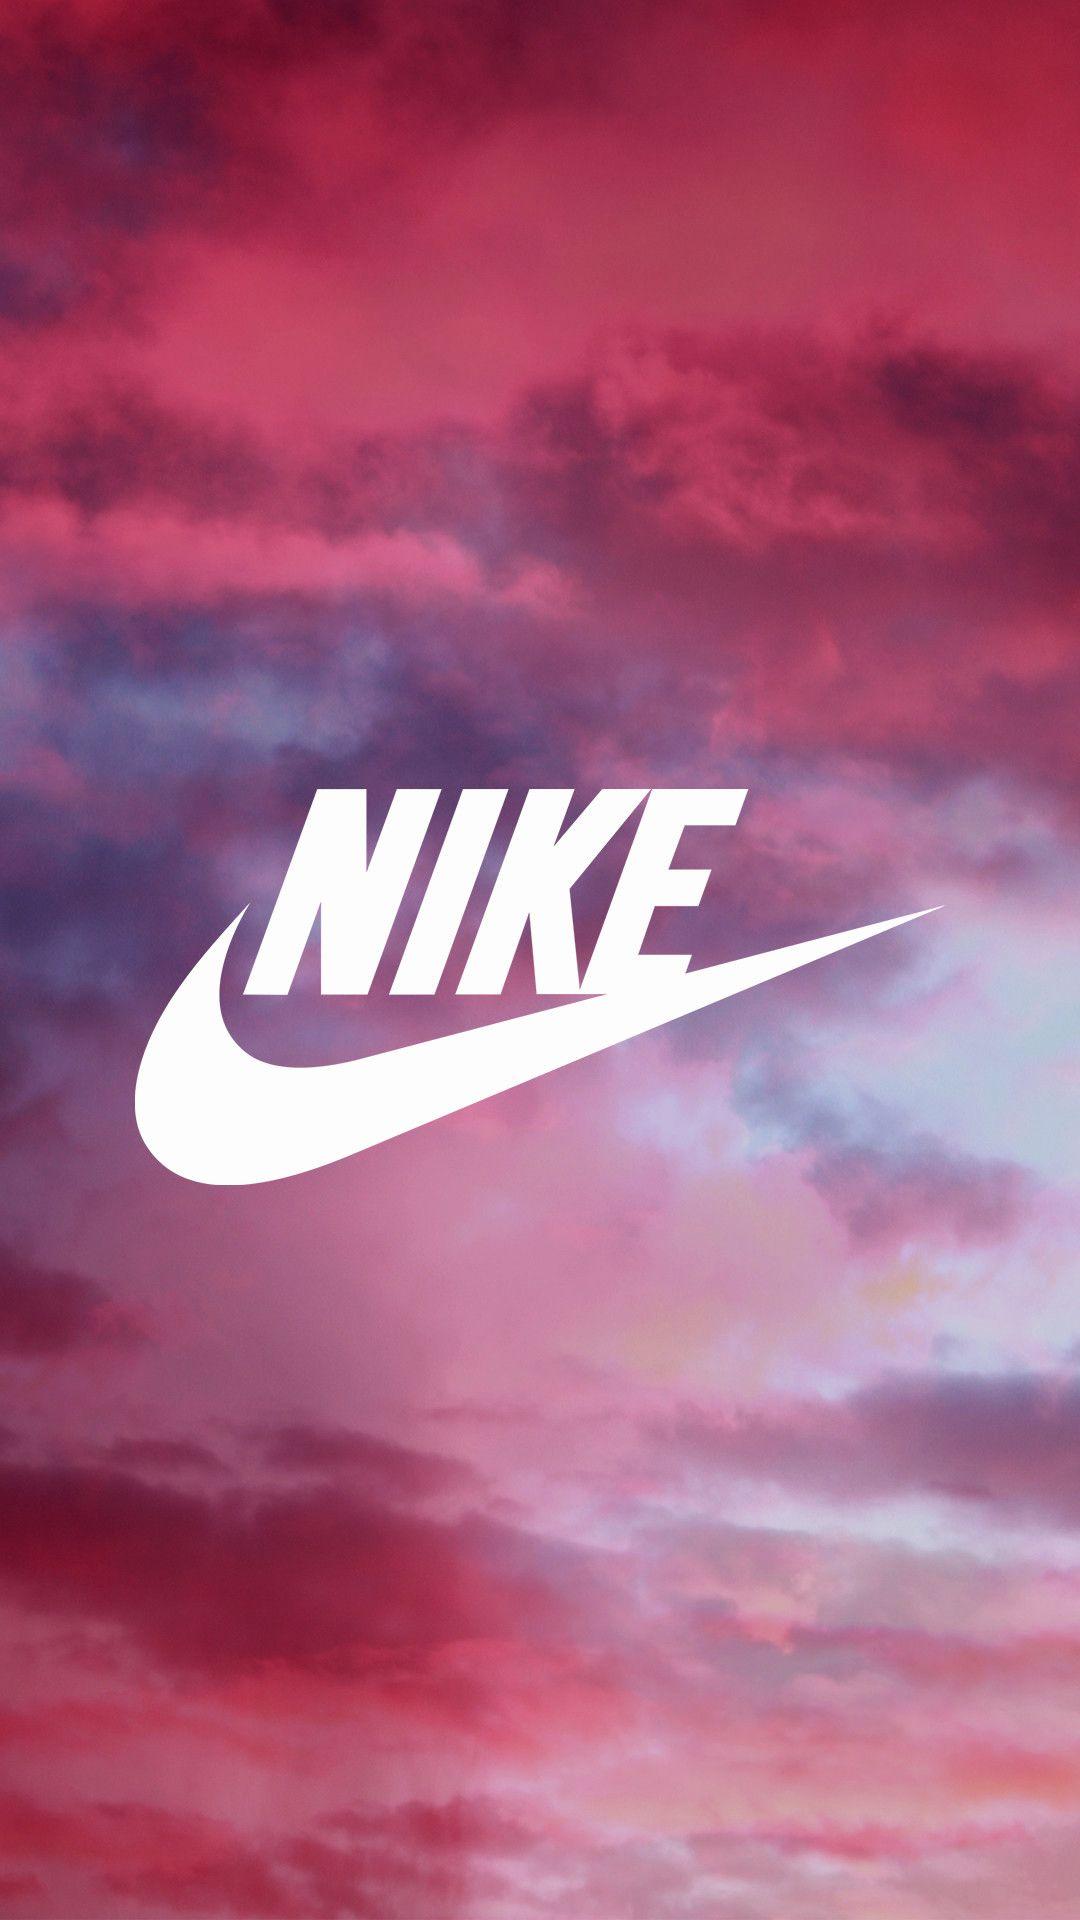 Nike Wallpaper 150 Wallpapers Hd Wallpapers Nike Wallpaper Iphone Nike Wallpaper Pink Nike Wallpaper